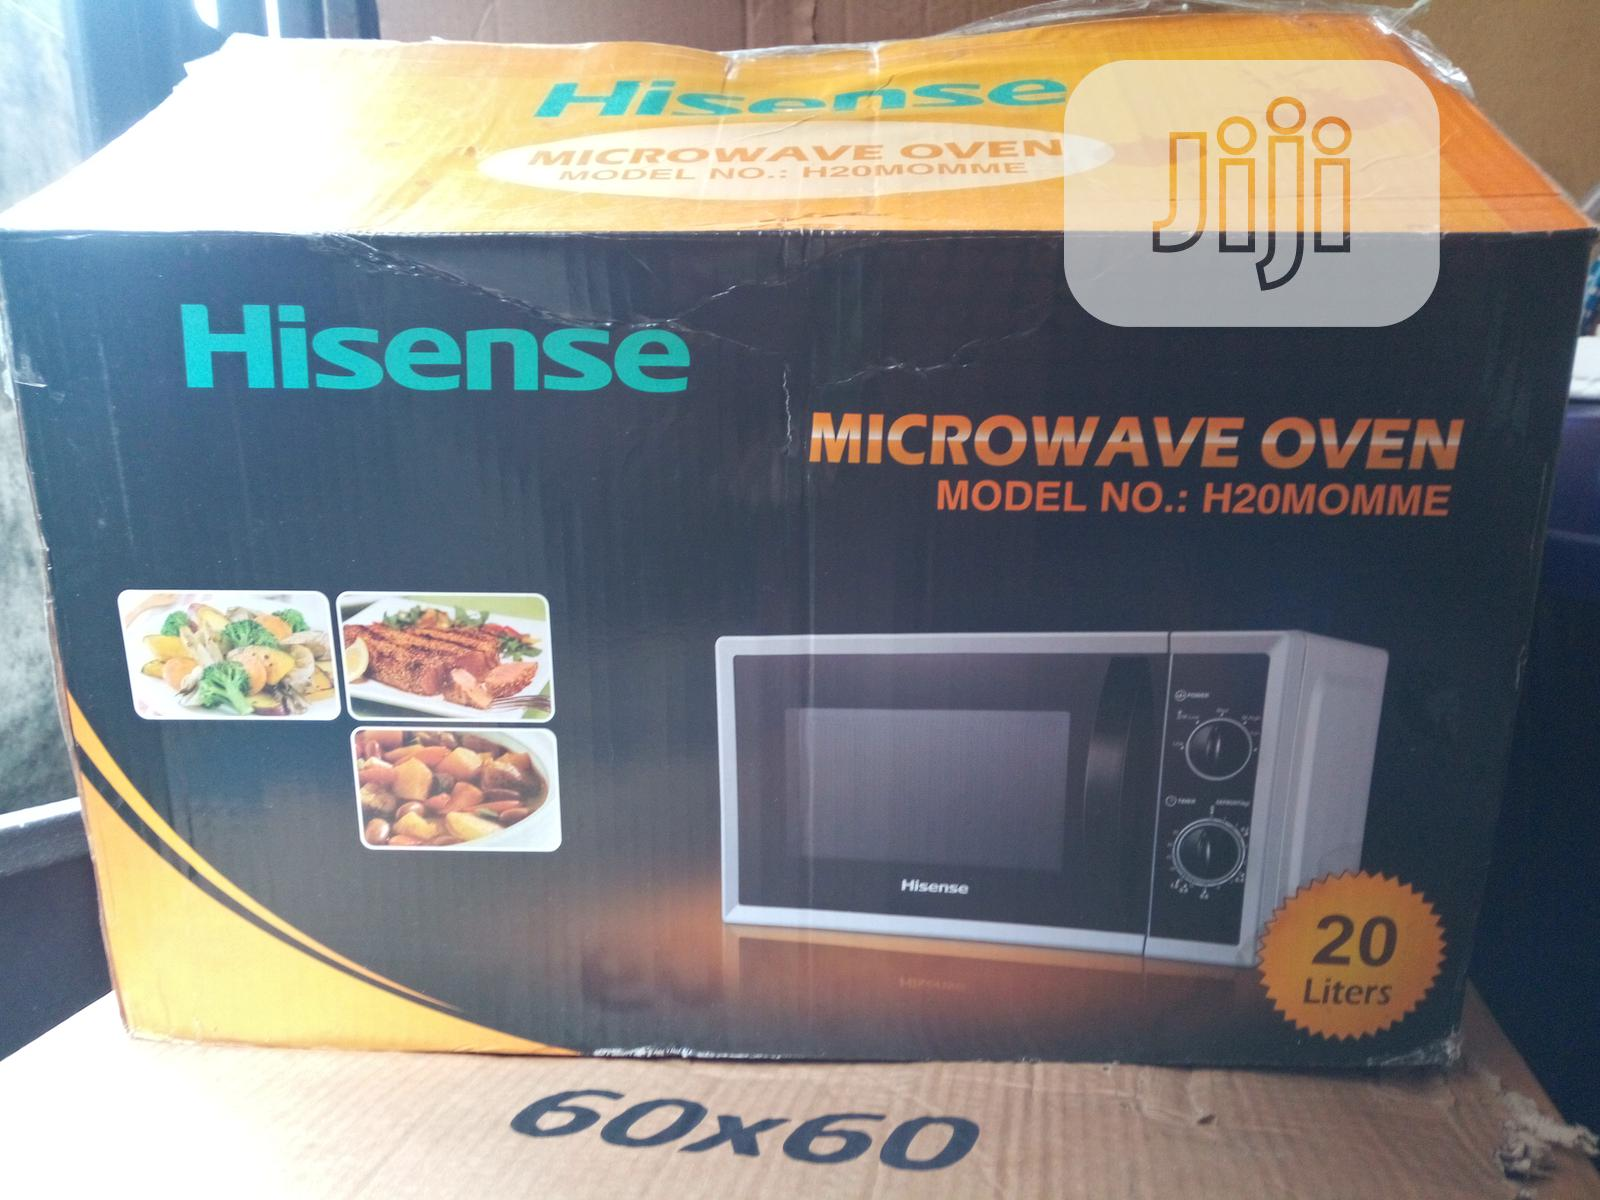 Hisense Microwave Oven 20 Litres